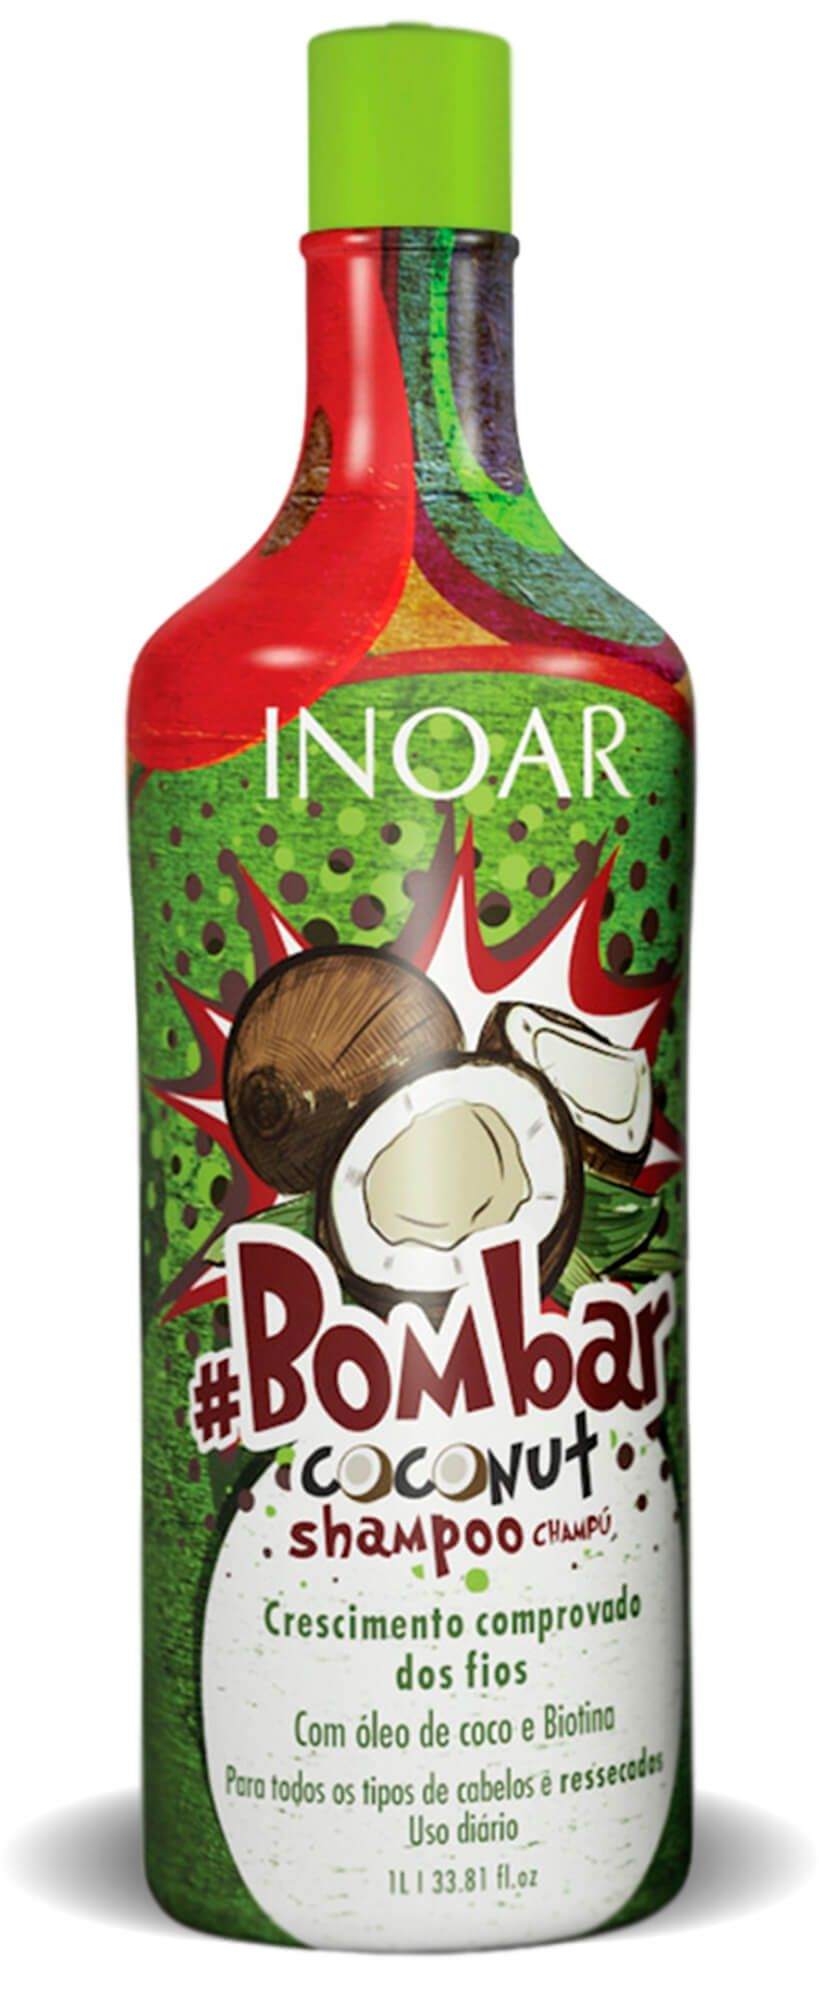 Kit Inoar bombar Coconut Shampoo + Condicionador 1l